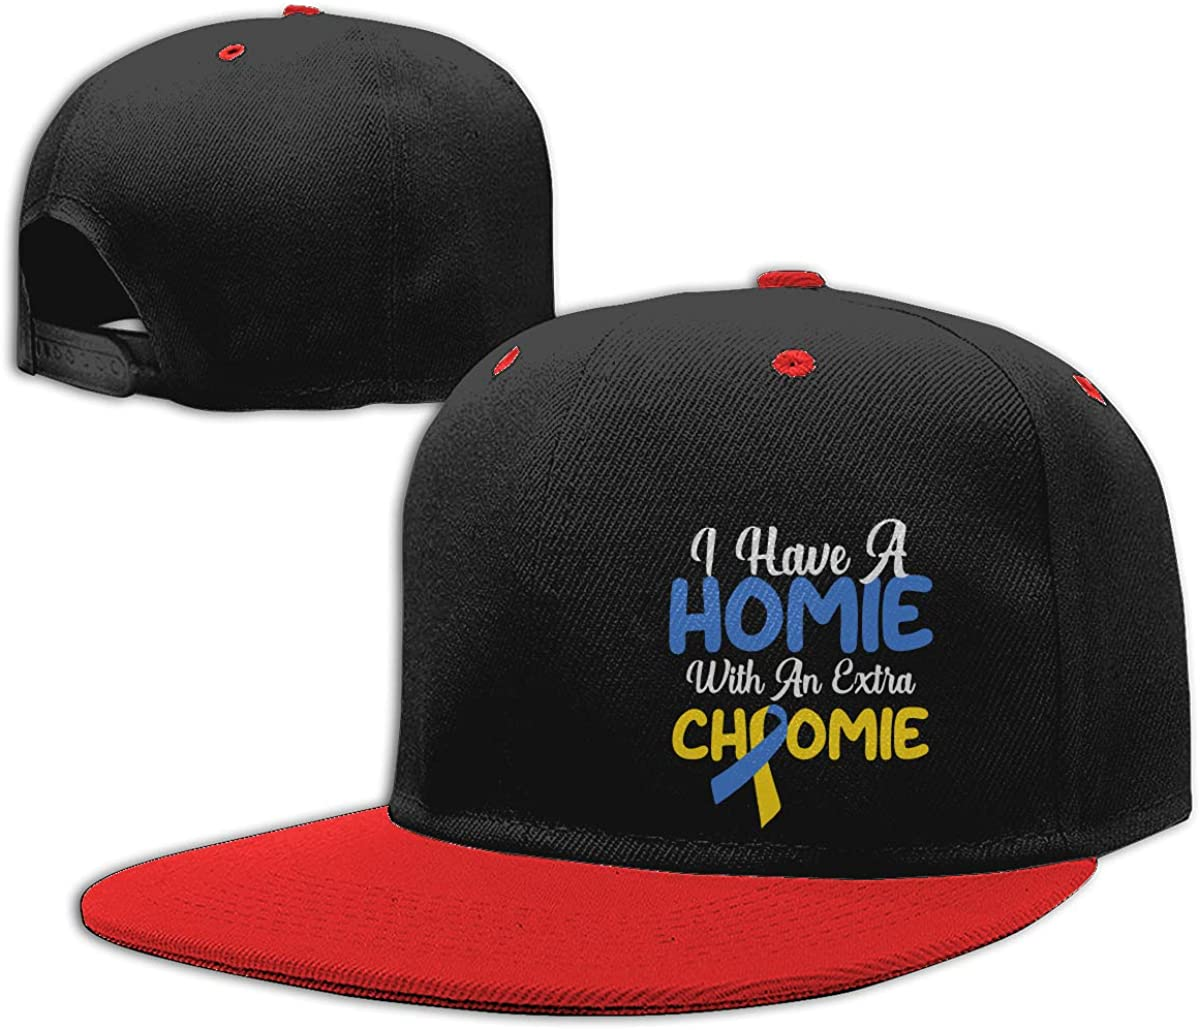 Men Womens Punk Rock Cap Down Syndrome Unisex Hip Hop Baseball Caps